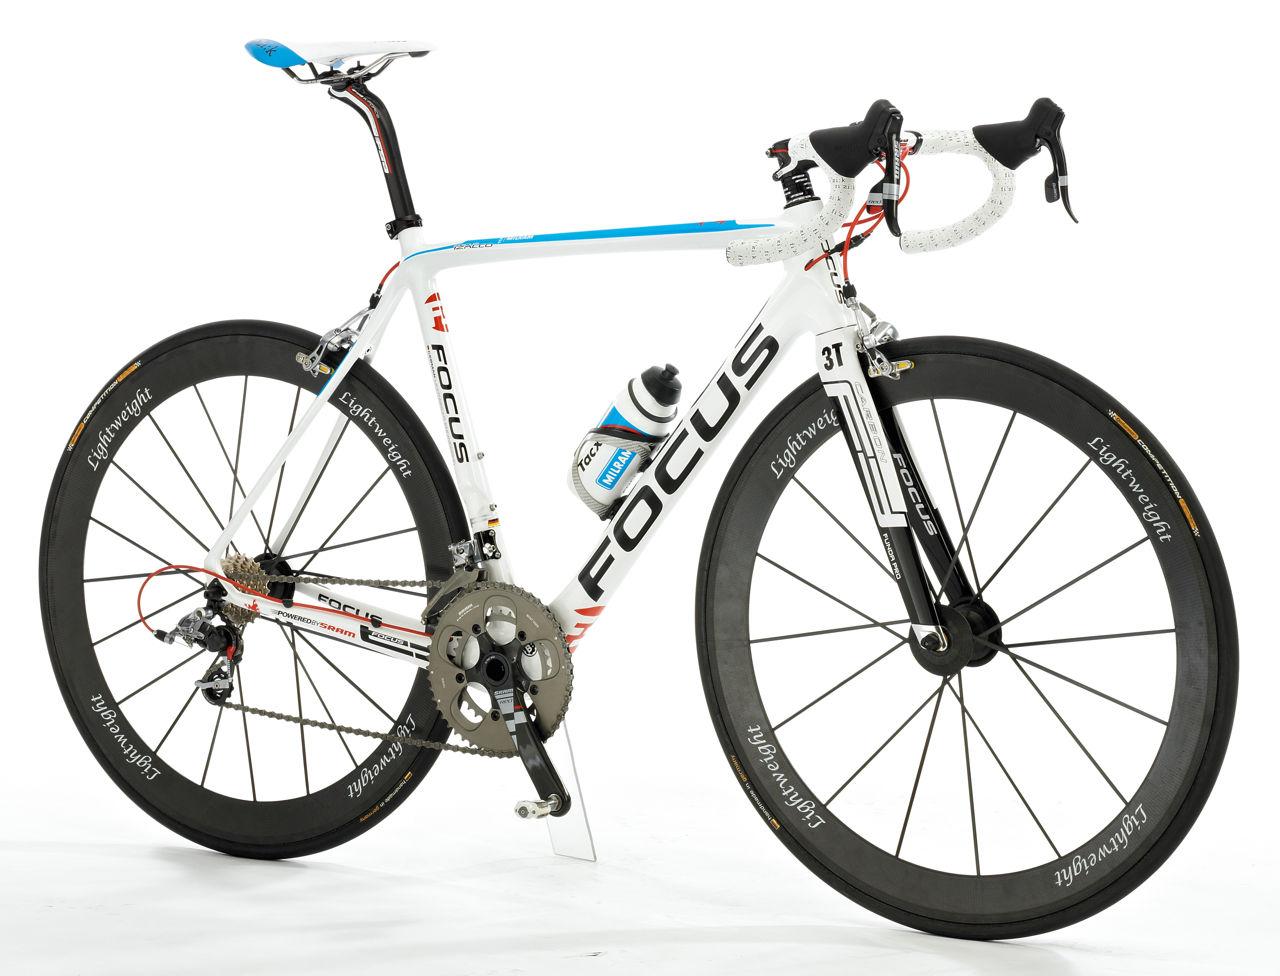 80852-fo10-izalco-team-milram-race-lw-conti.jpg